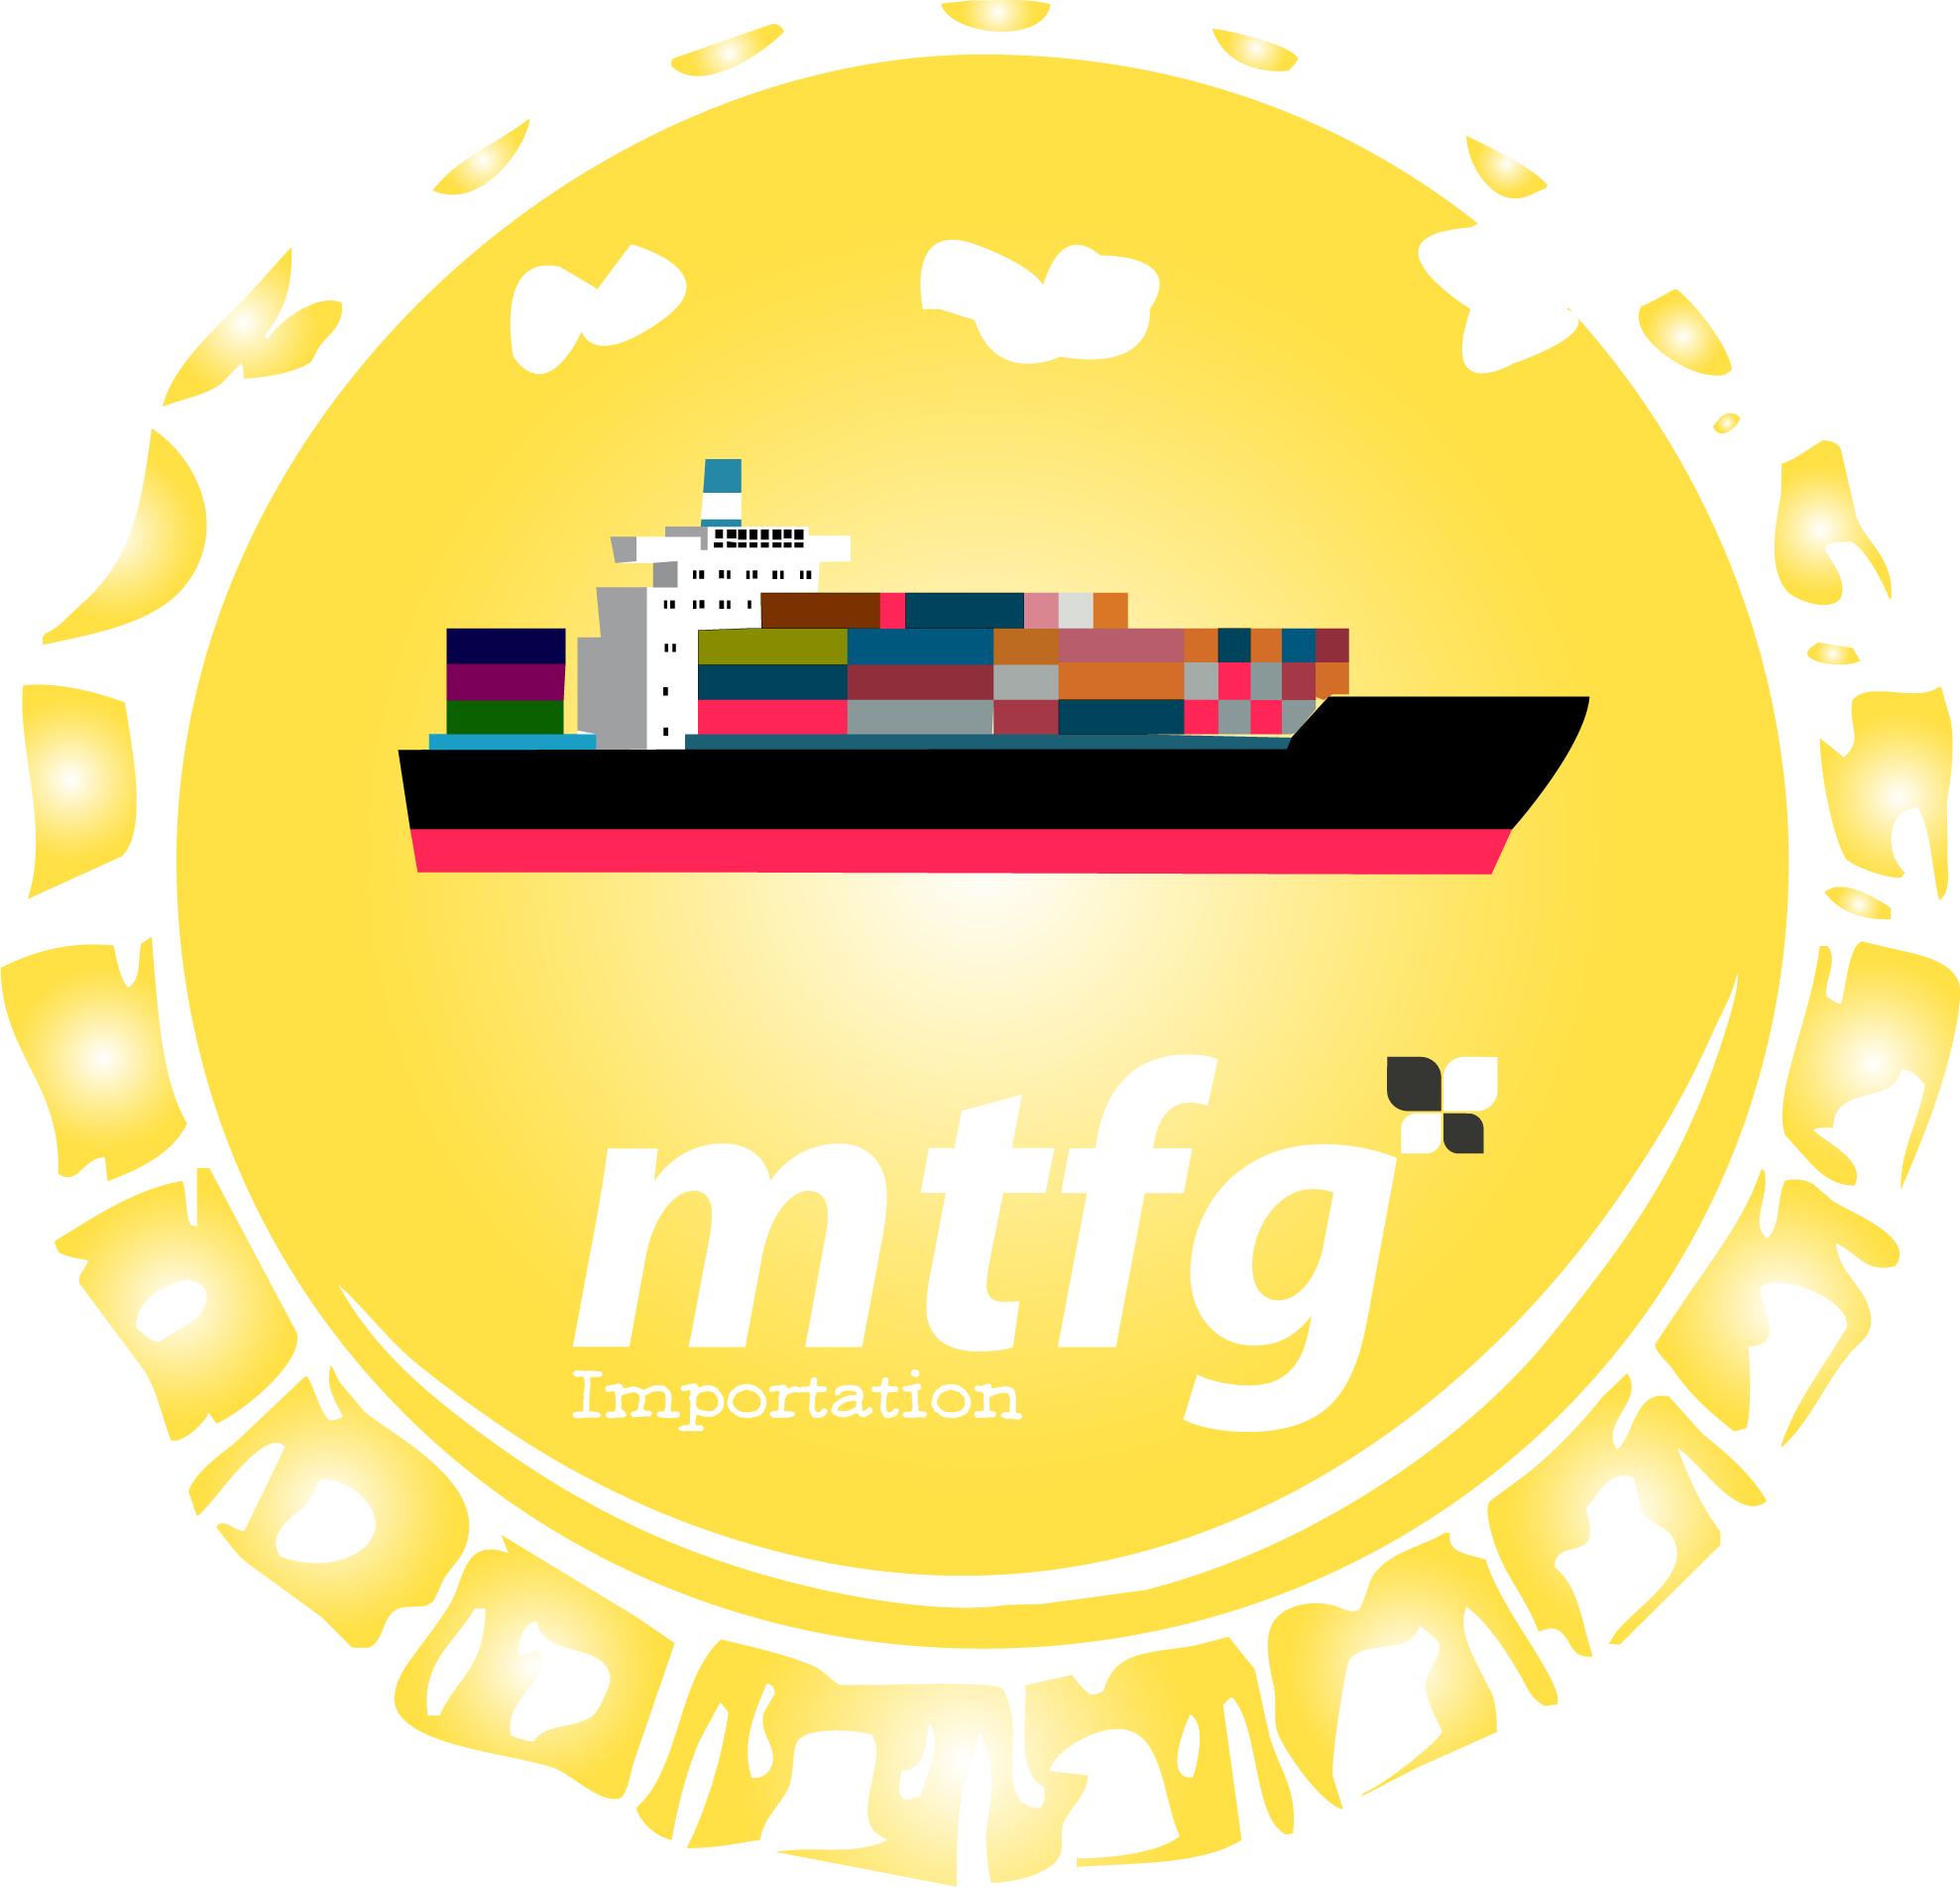 MTFG Importation